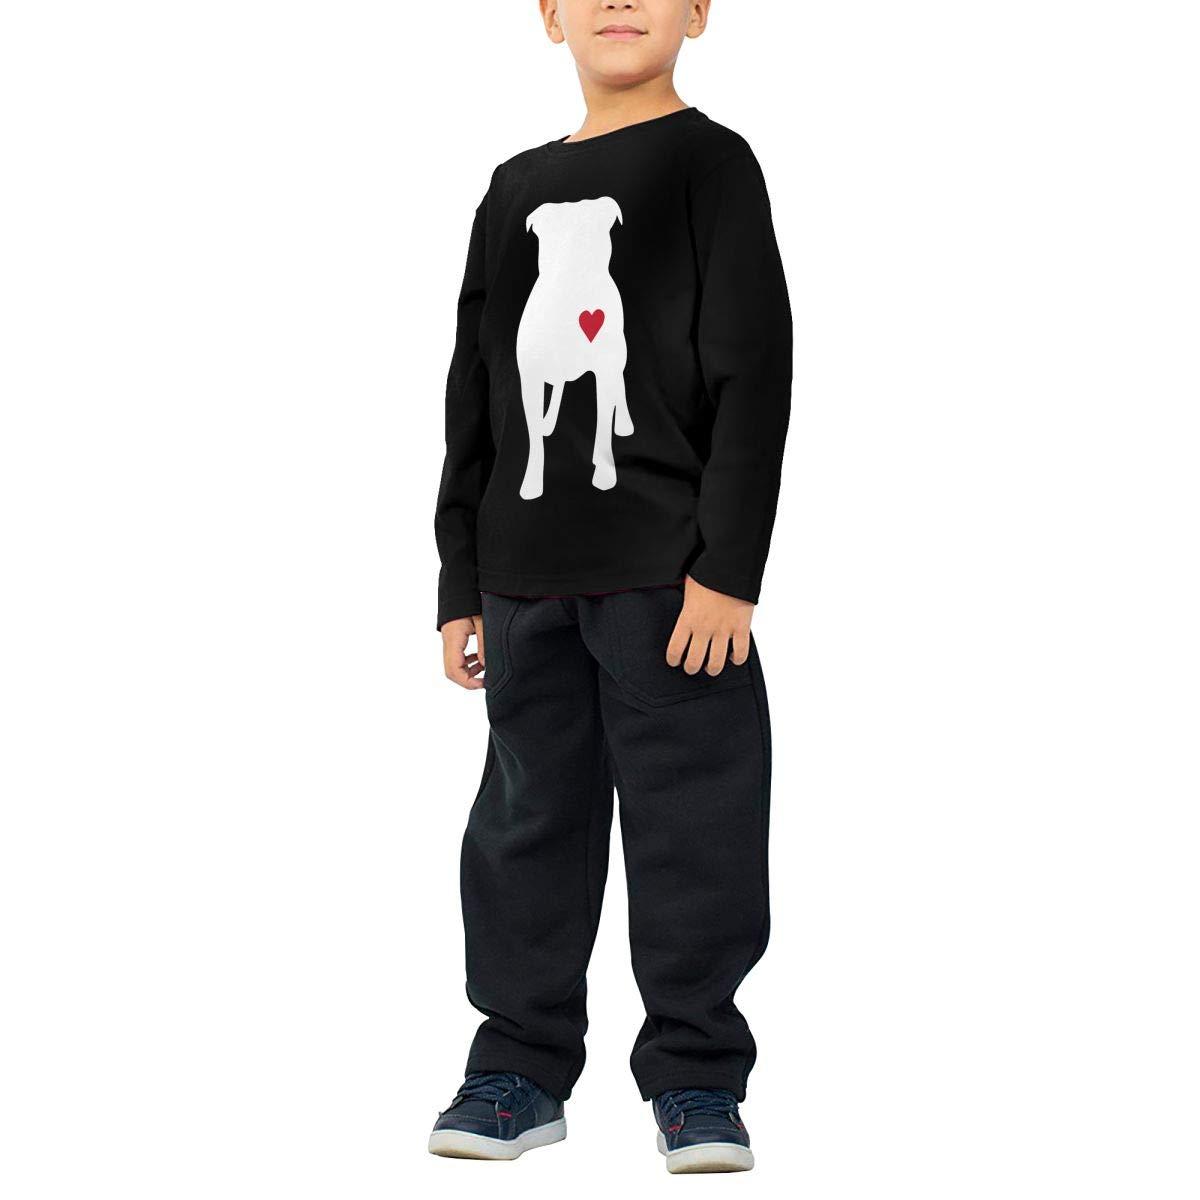 Fryhyu8 Baby Boys Childrens Pitbull Heart Printed Long Sleeve 100/% Cotton Infants Tee Shirt